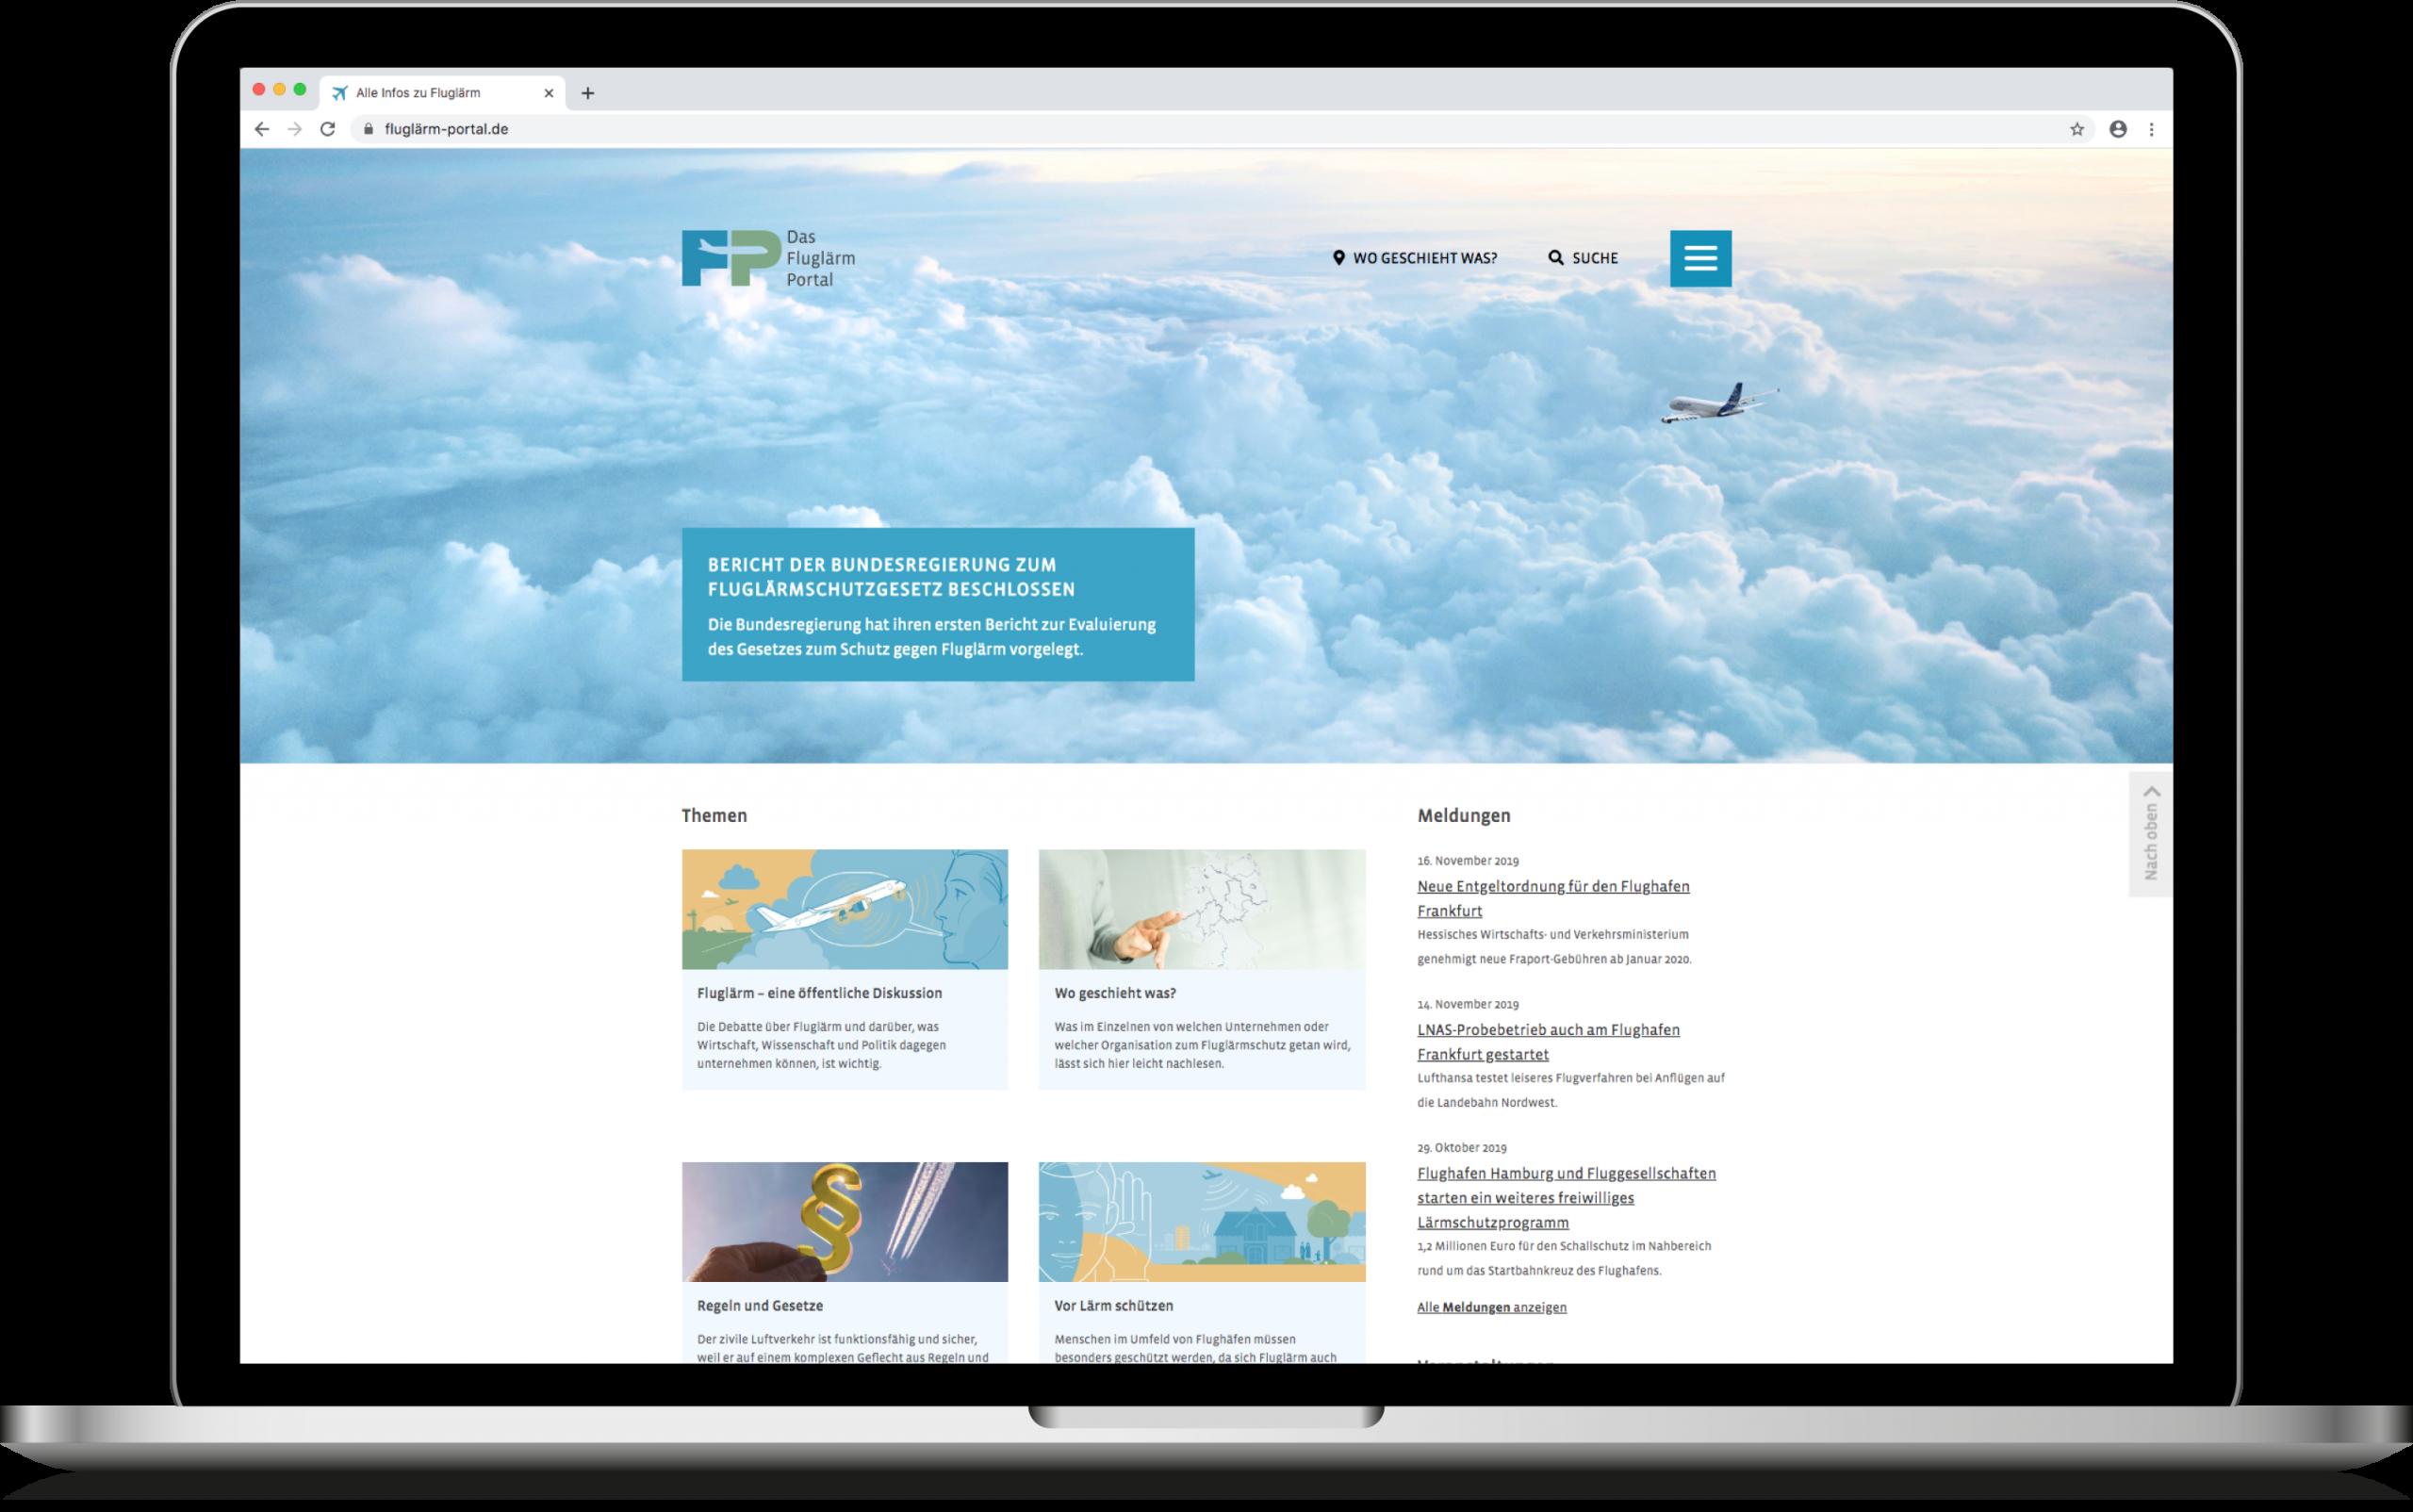 Fluglärm: Das Flugärm-Portal der Luftfahrt